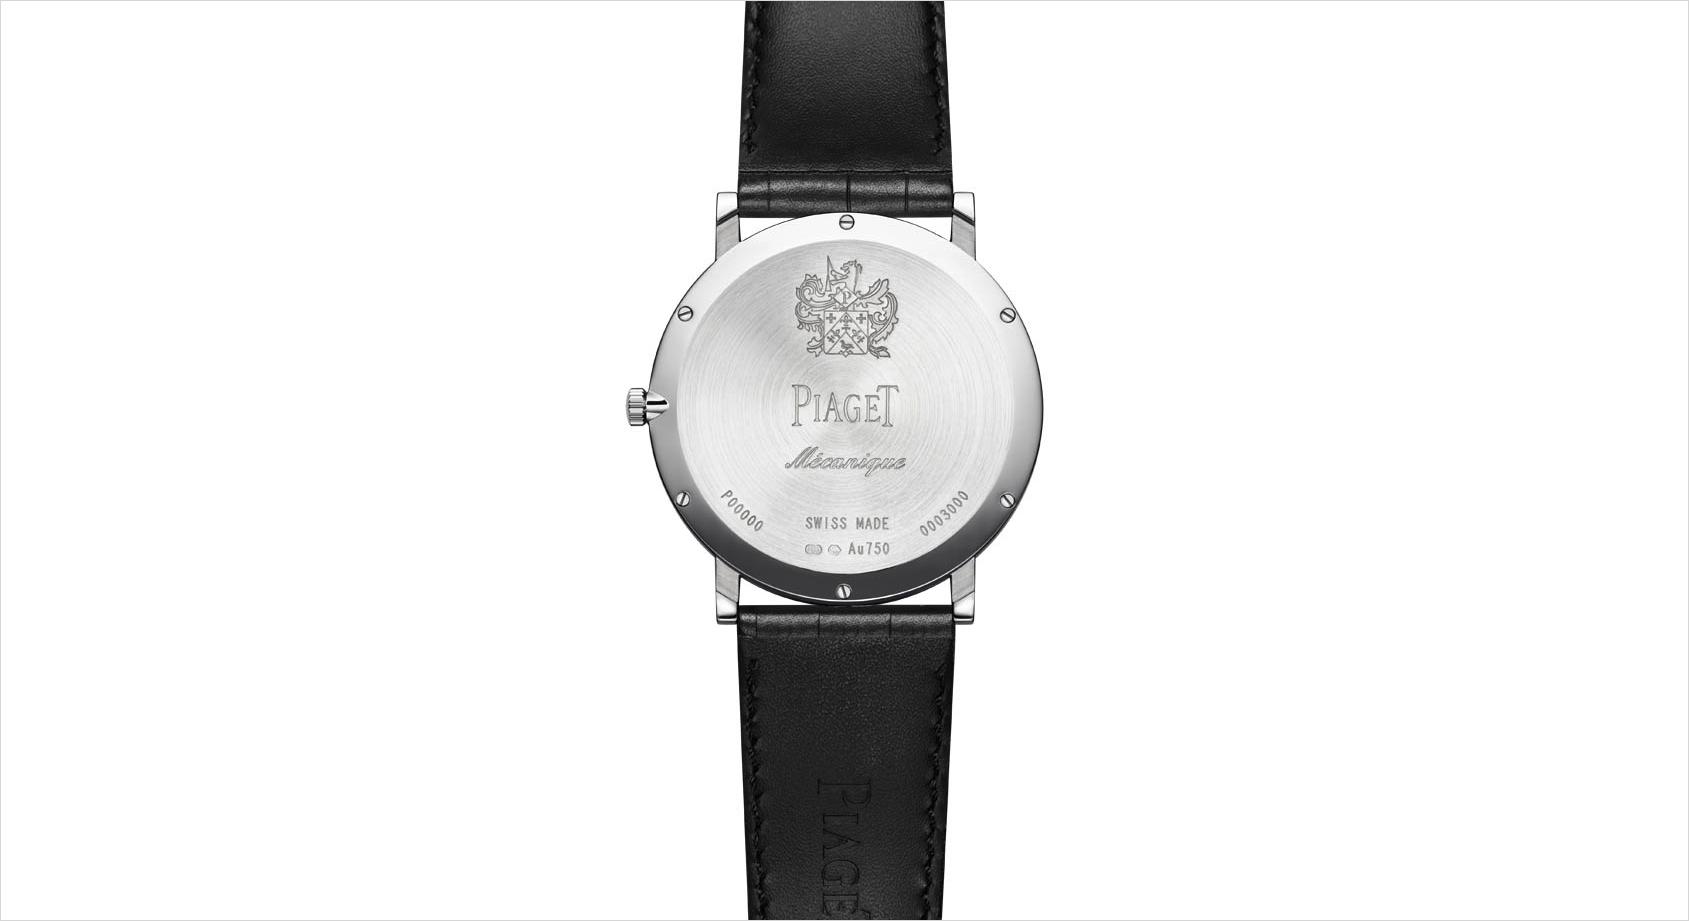 anteprima-sihh-2014-piaget-altiplano-900p-prezzo-price-0-100_4